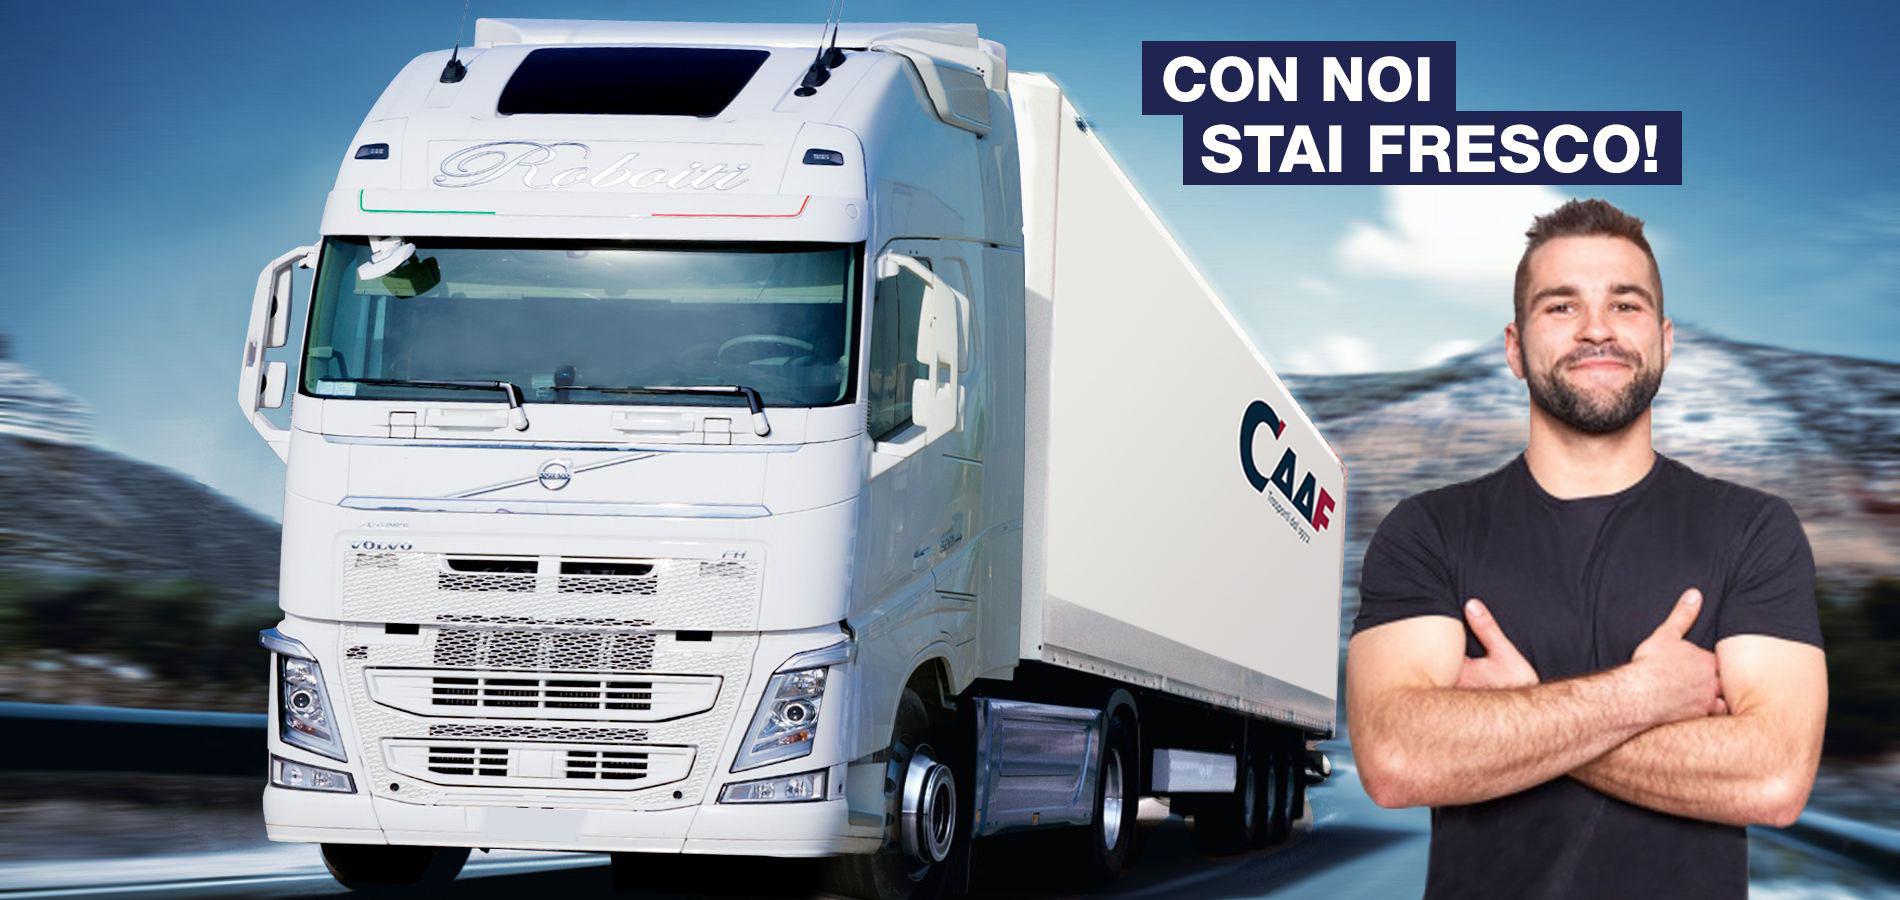 con-noi-stai-fresco-caaf-trasporti02